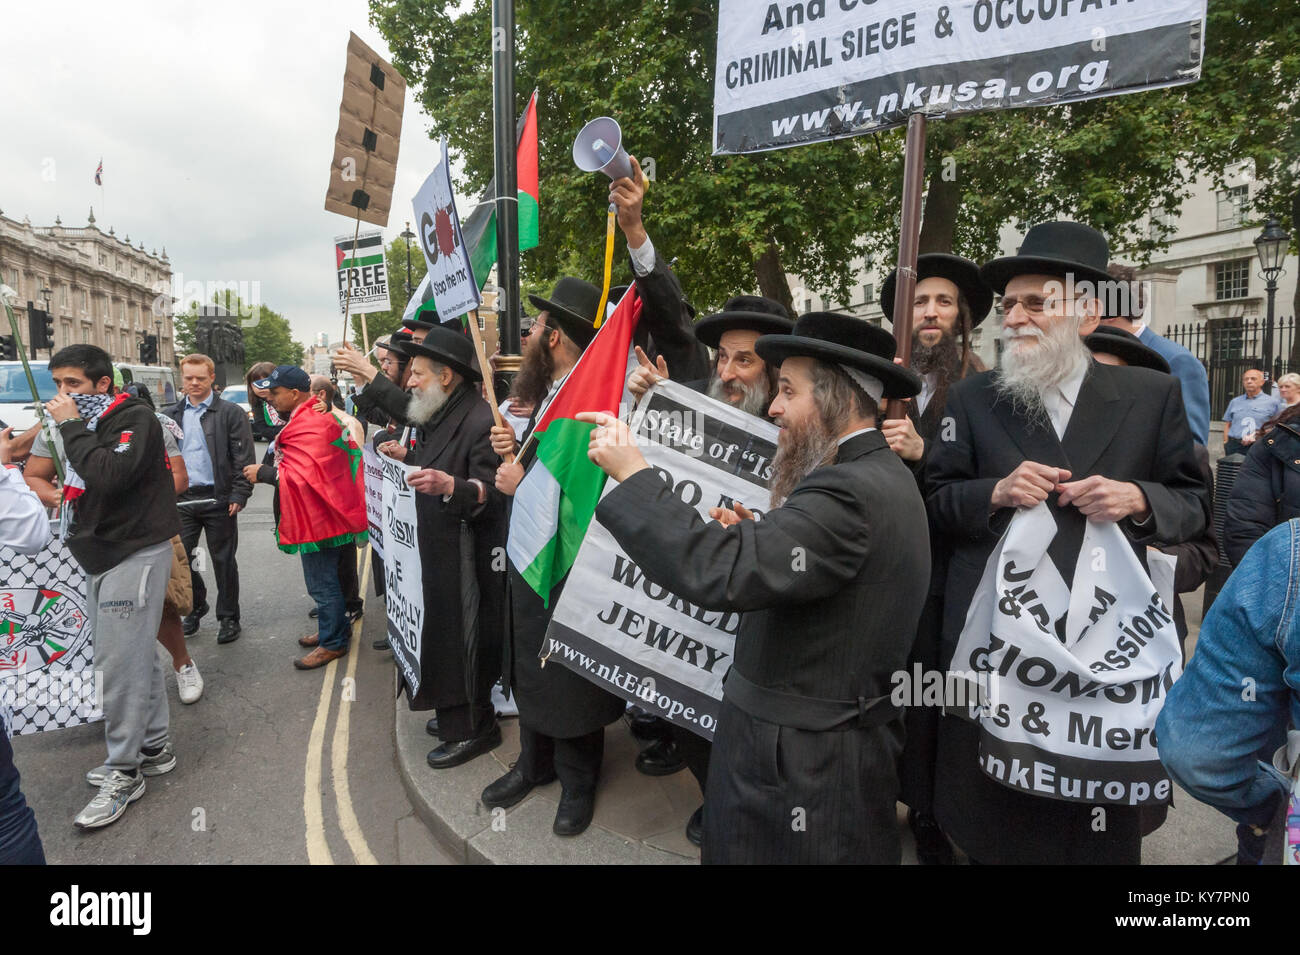 Neturei Karta anti-Zionist Jews at the pro-Palestine protest against the visit of Israeli PM Netanyahu, accused - Stock Image